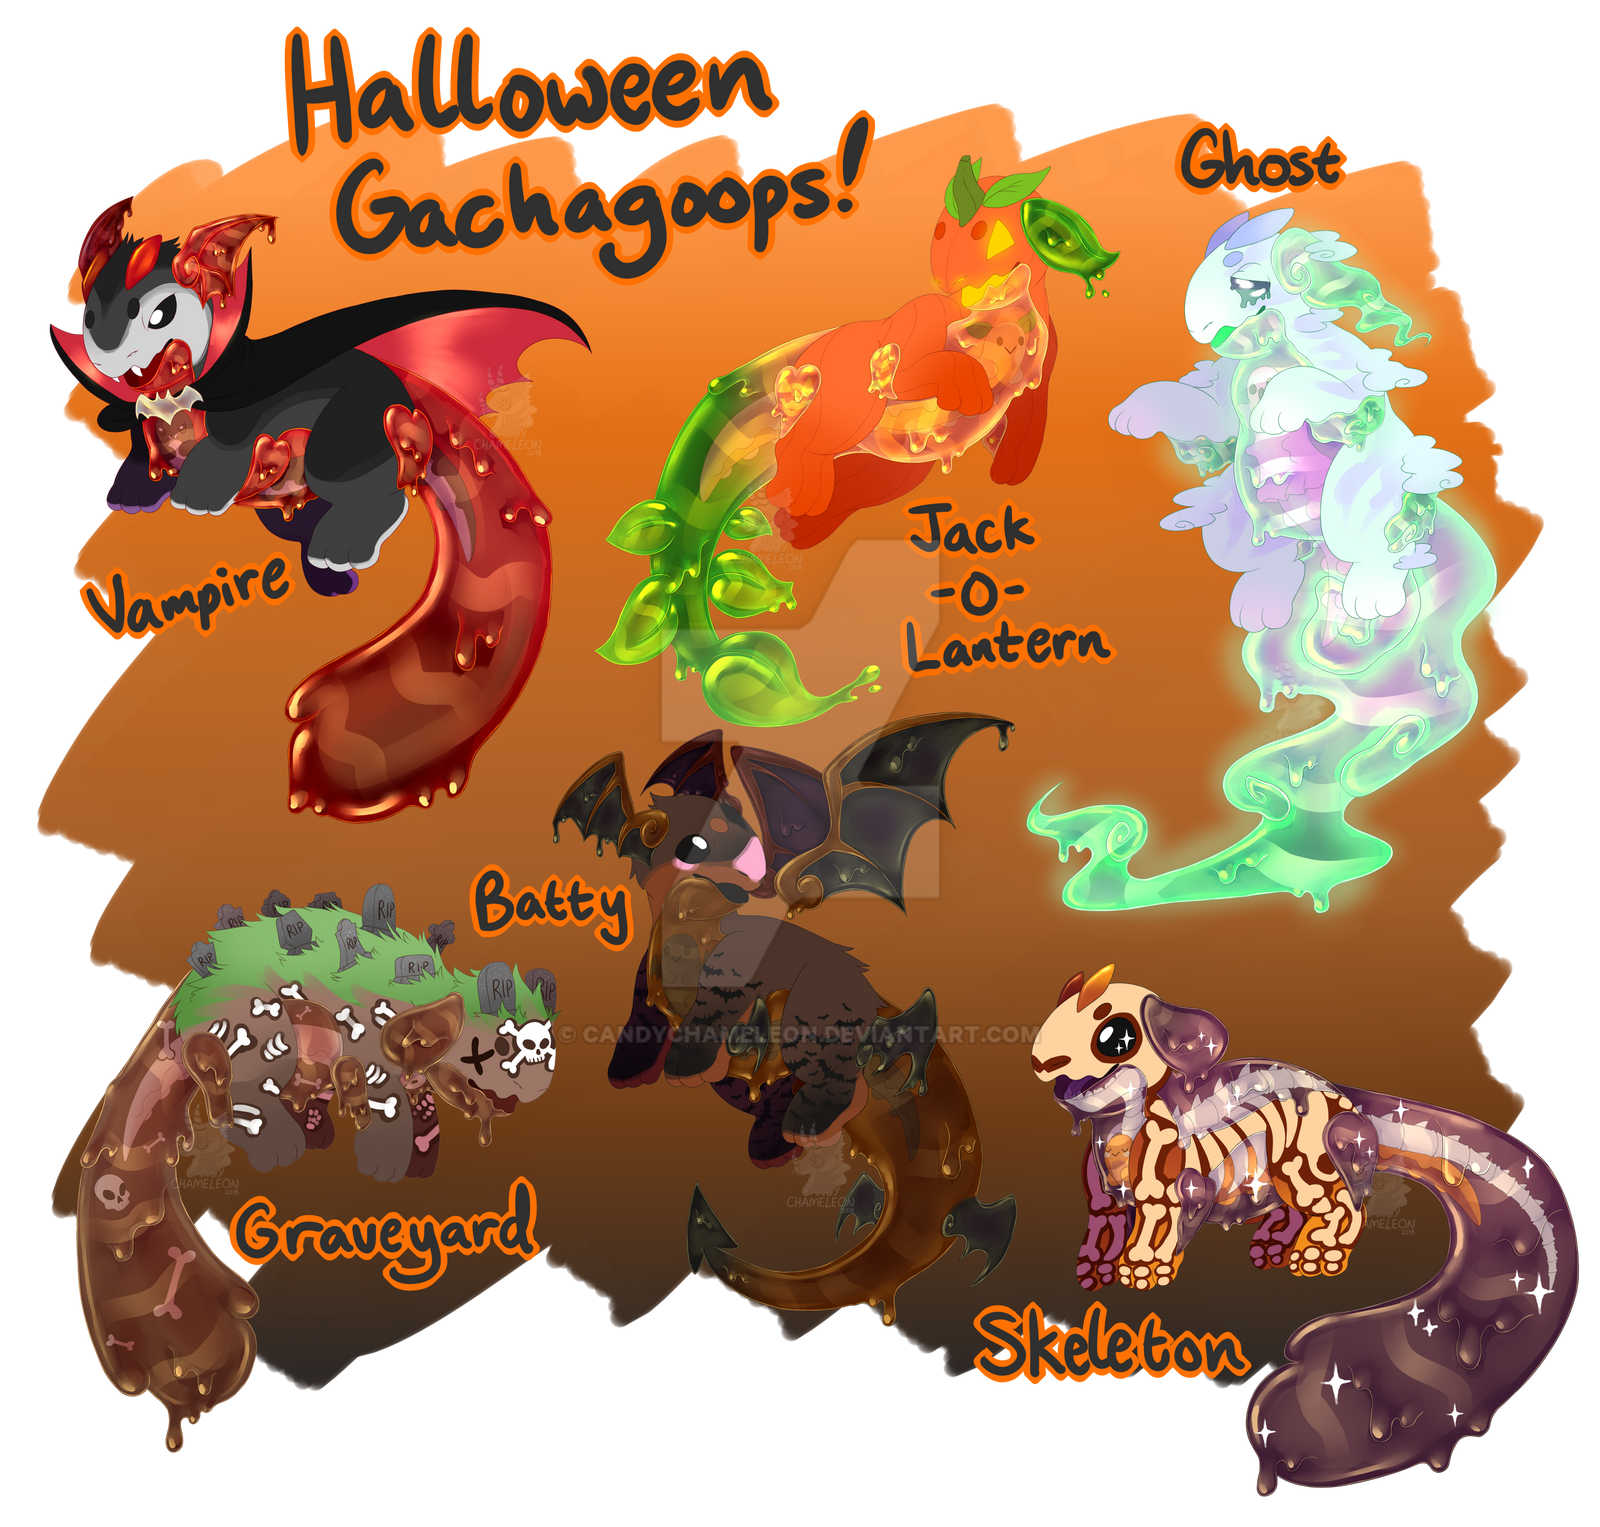 [CLOSED] Halloween Gachagoop Batch! AUCTION